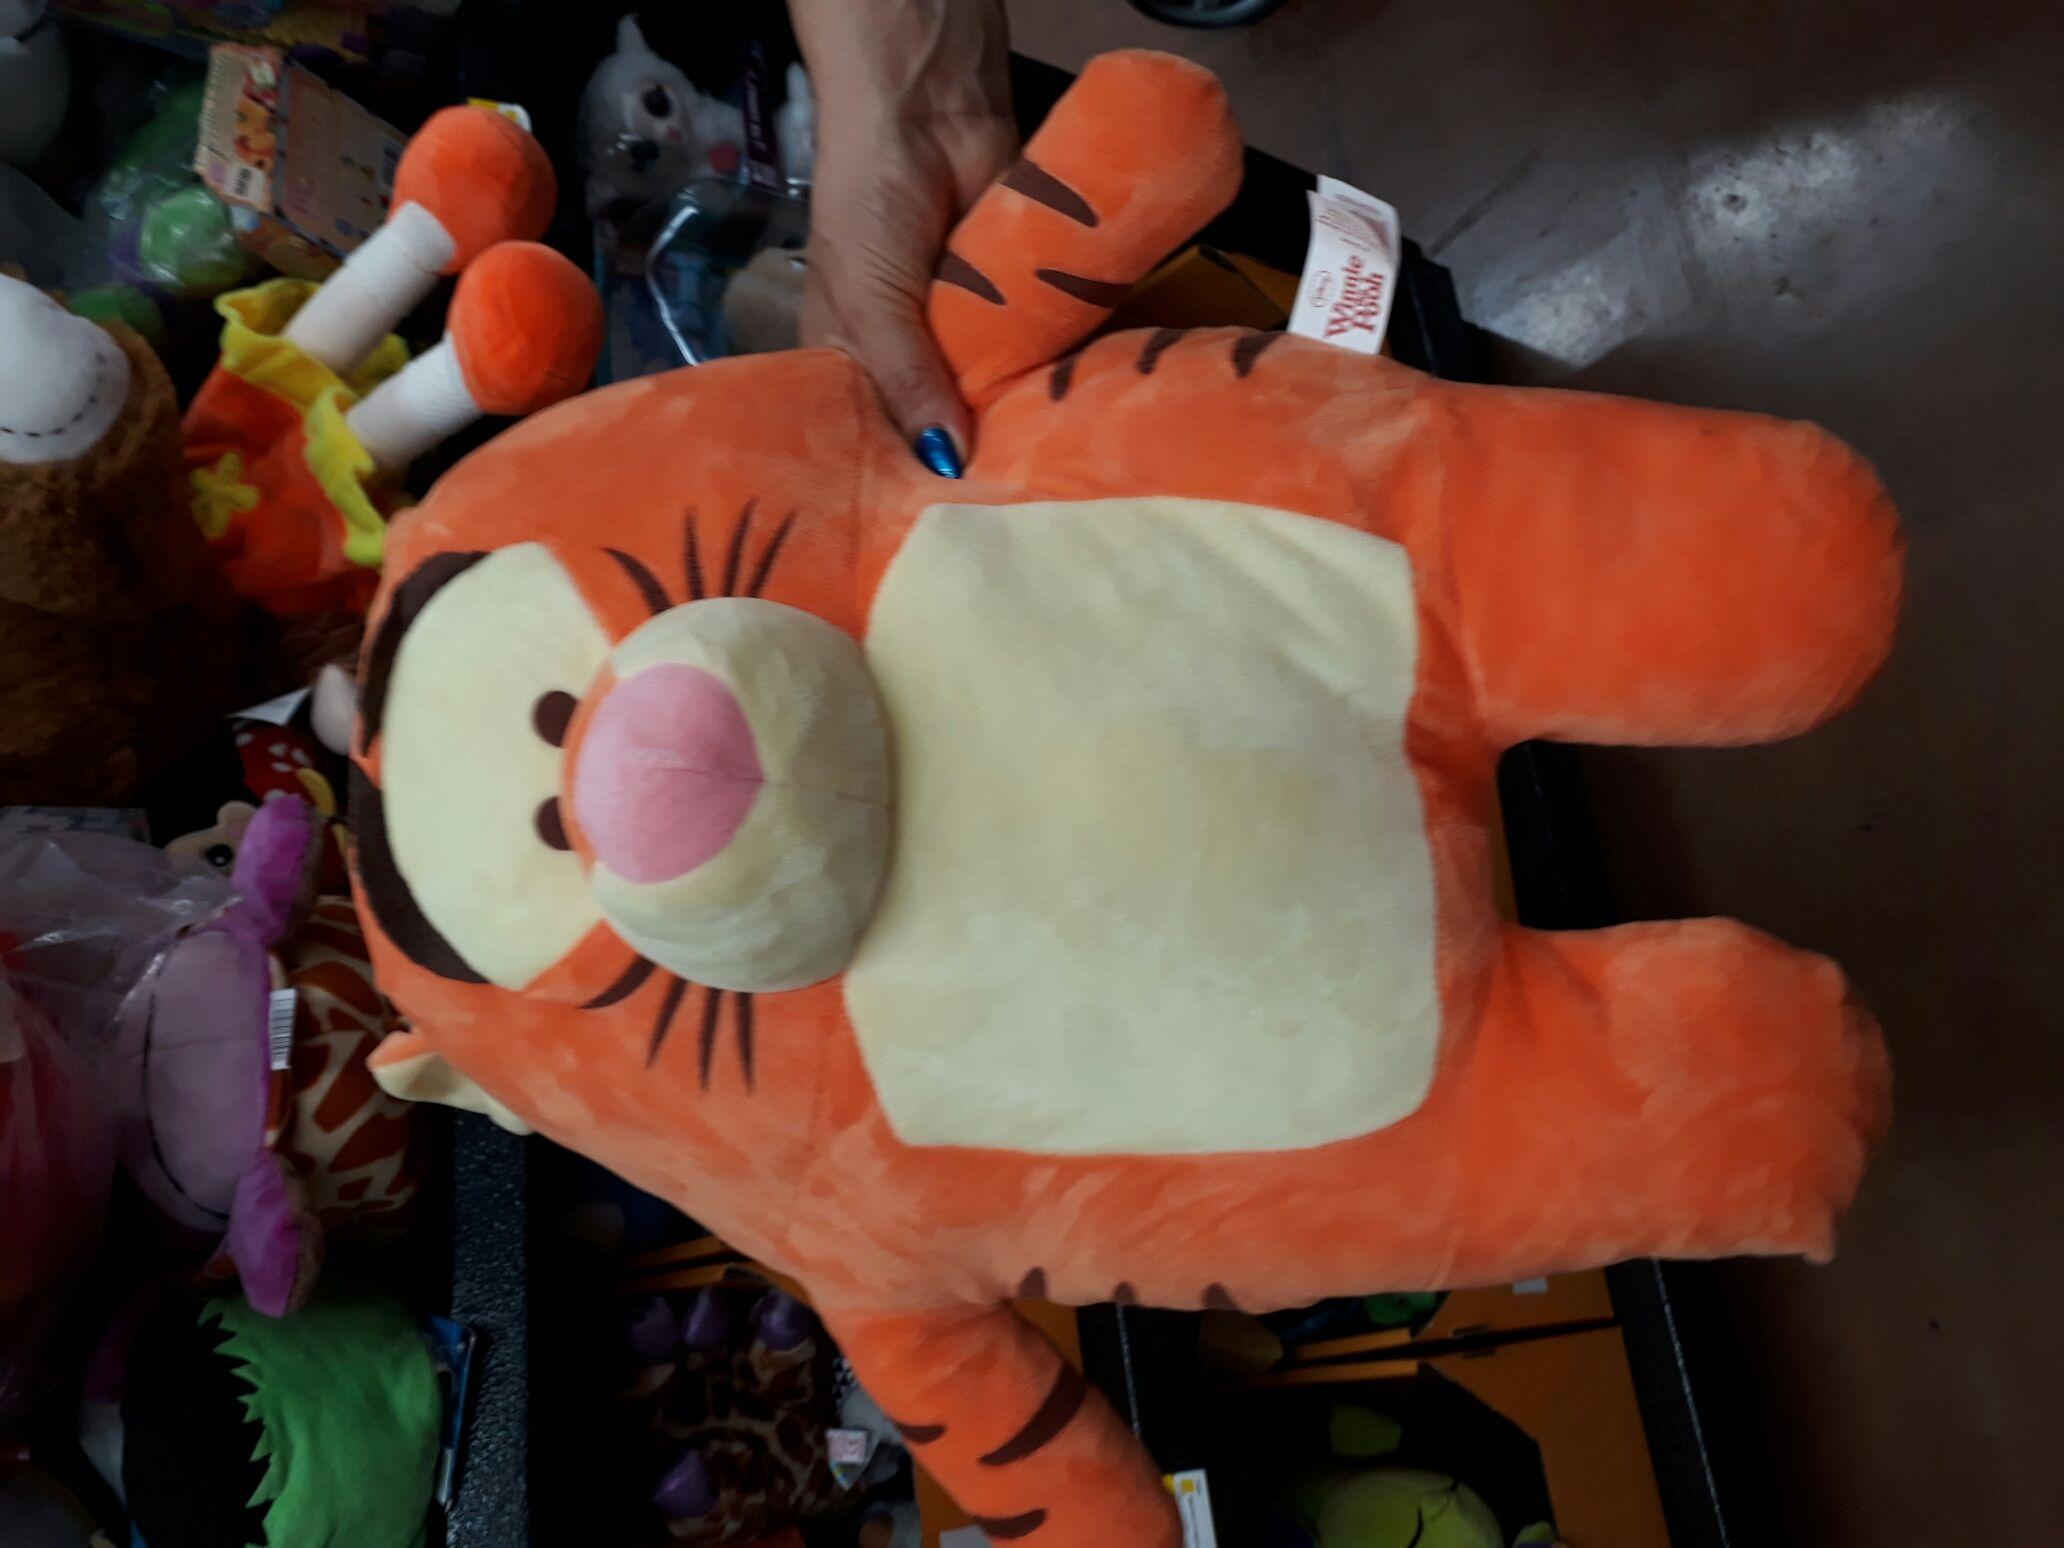 Walmart: Muñecos de winnie pooh a $155.02